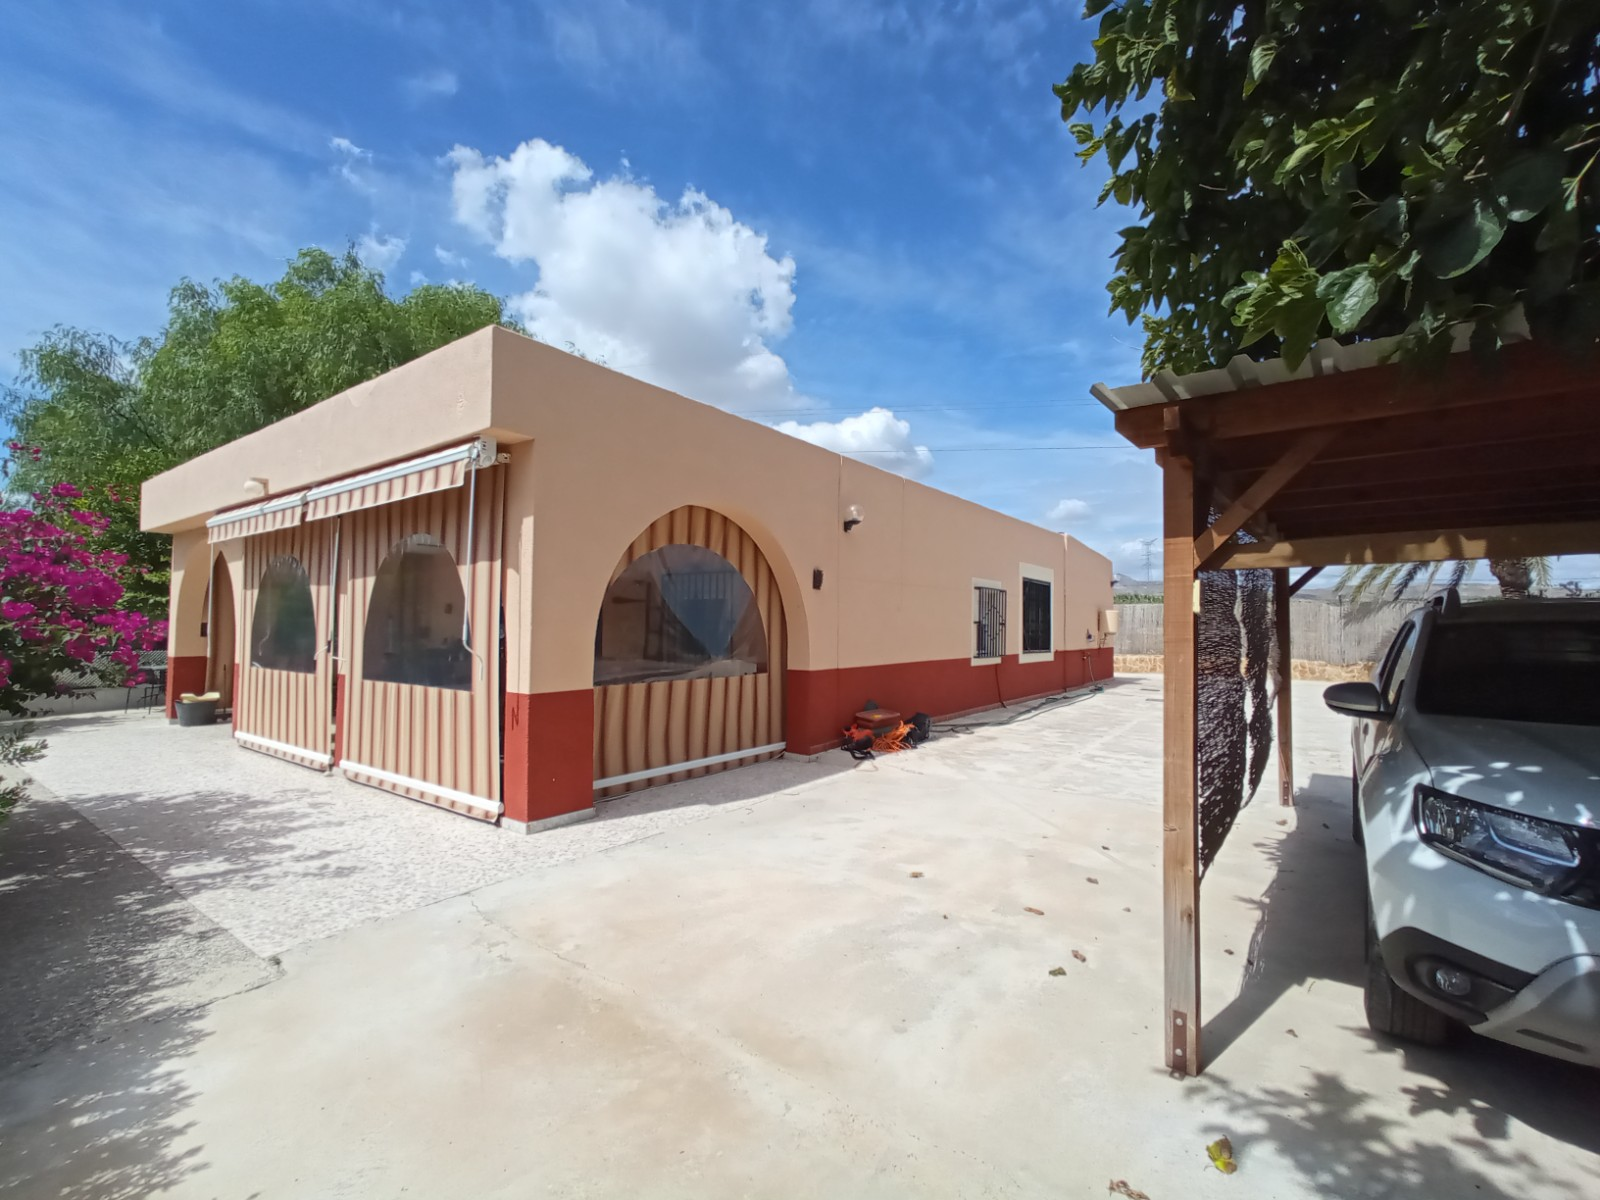 For sale: 5 bedroom finca in Crevillente, Costa Blanca